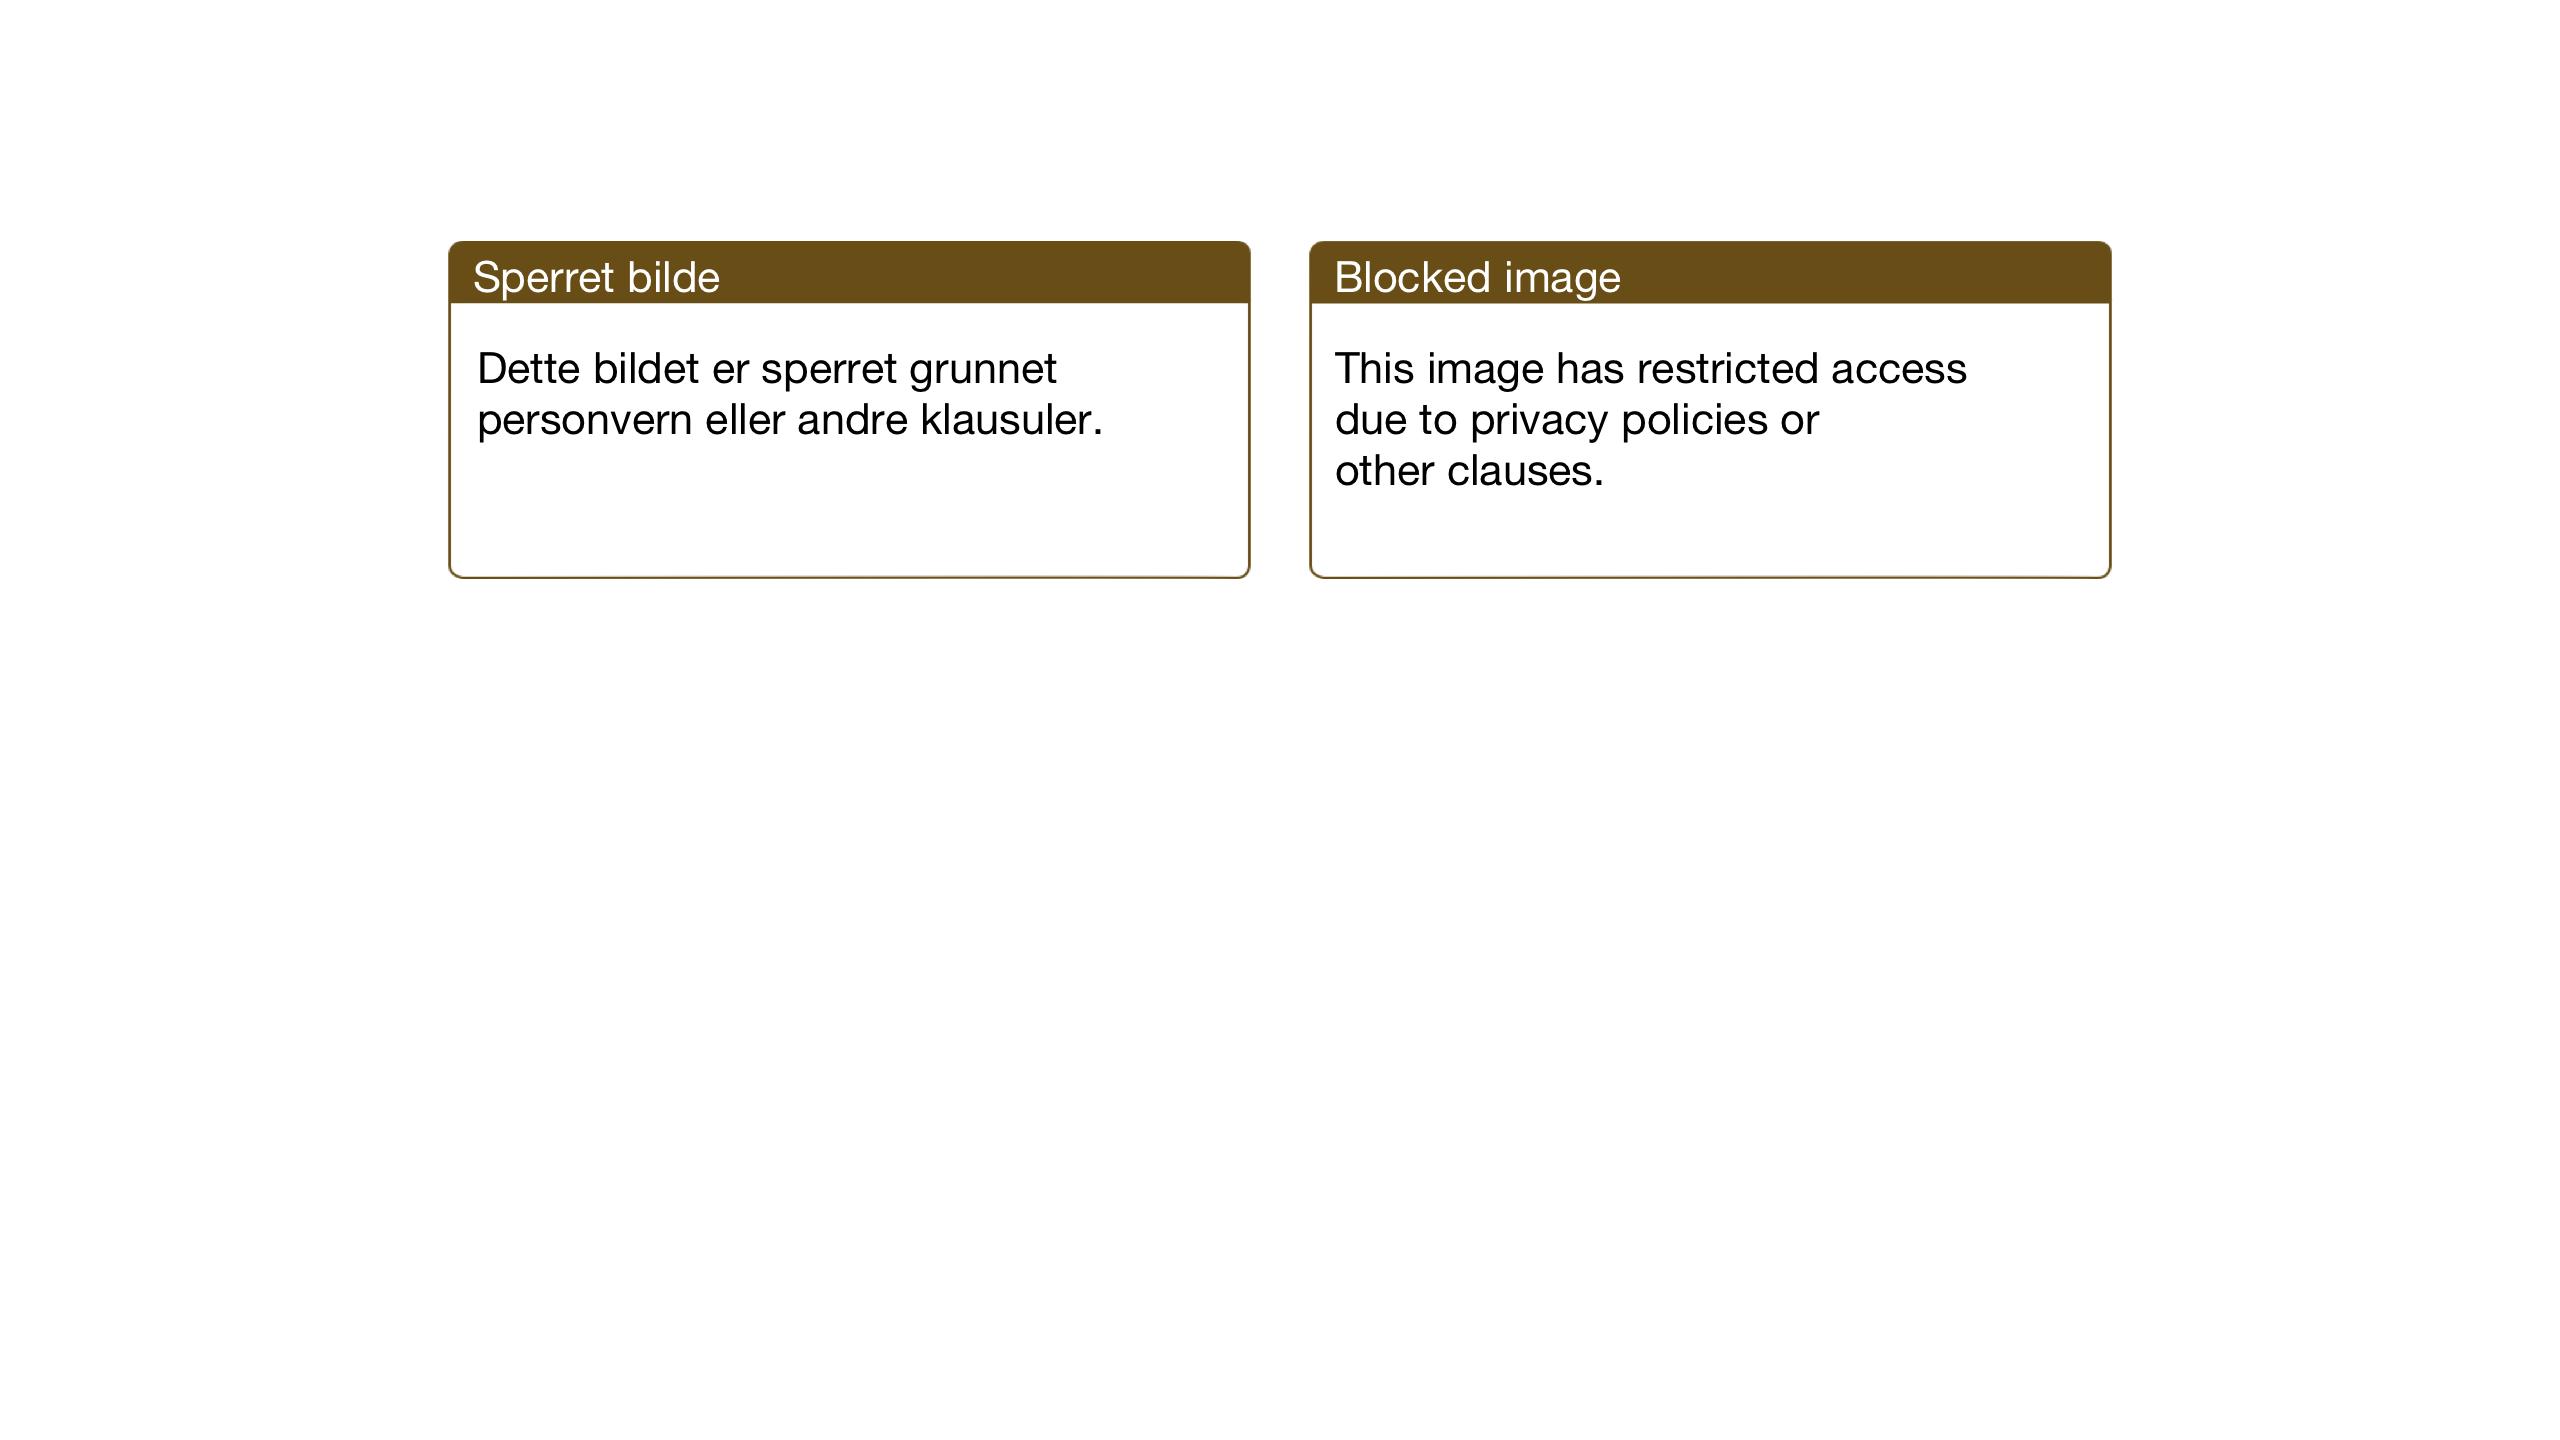 SAB, Domkirken Sokneprestembete, H/Haa: Ministerialbok nr. C 9, 1958-2001, s. 30b-31a